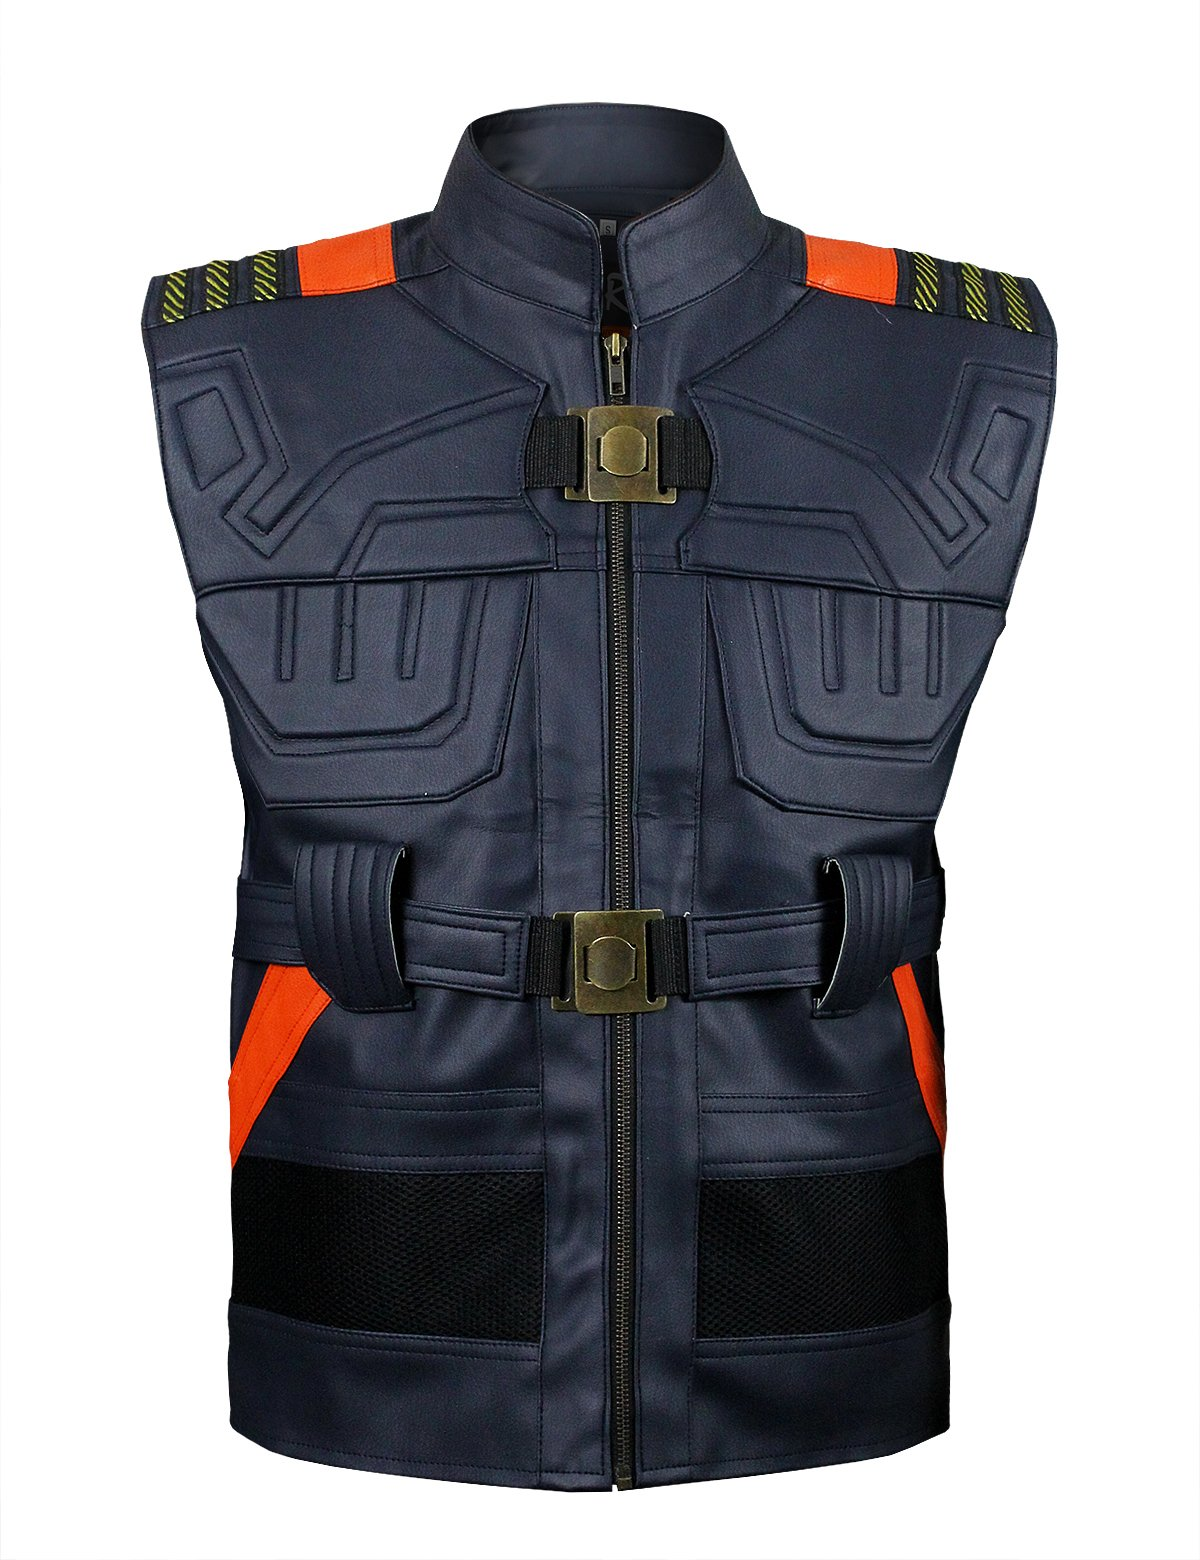 Erik Killmonger Vest | Black Panther Vest | Michael B Jordan Vest